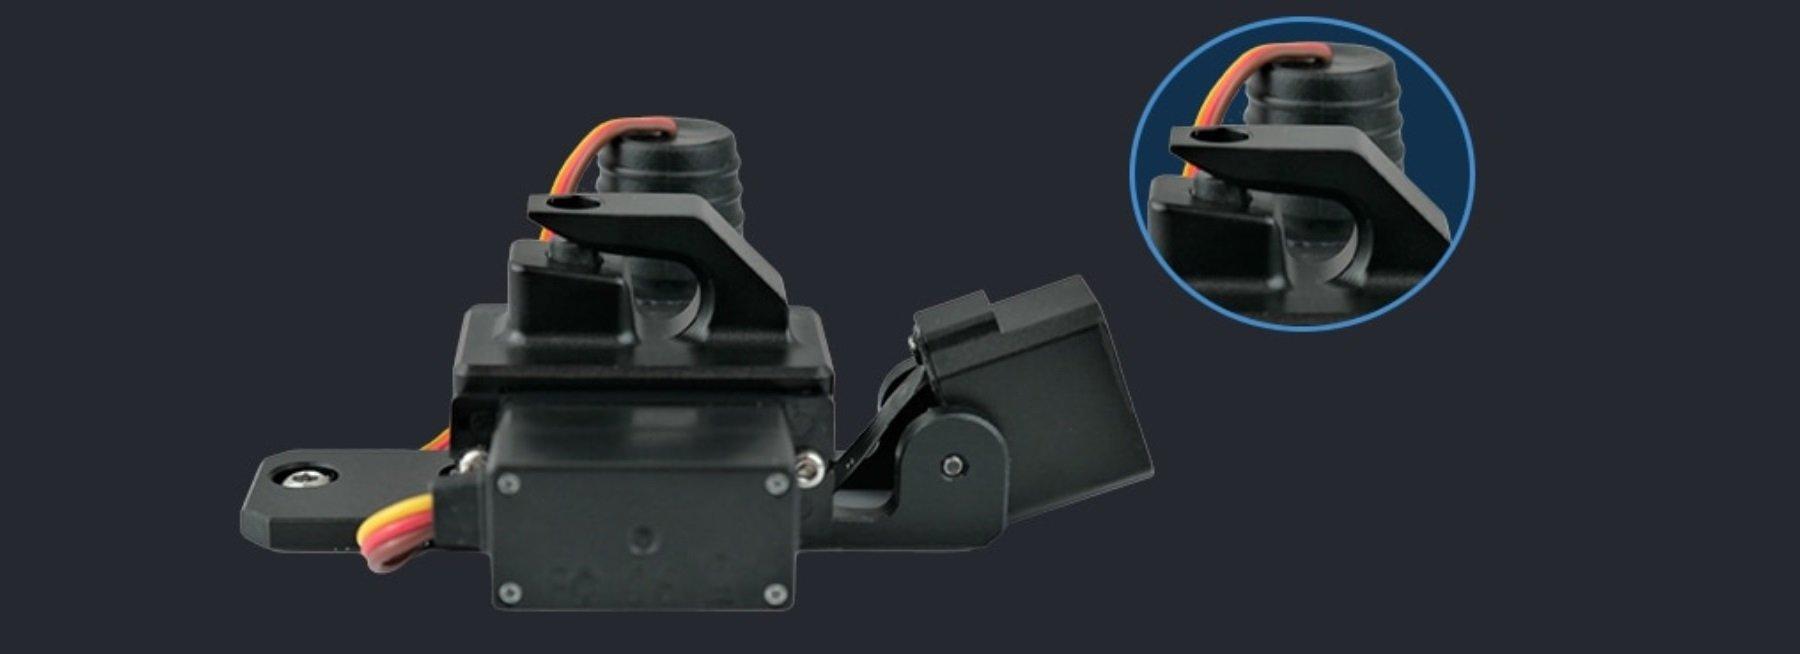 IDEAFLY Poseidon Pro V2 Bait-dropping device